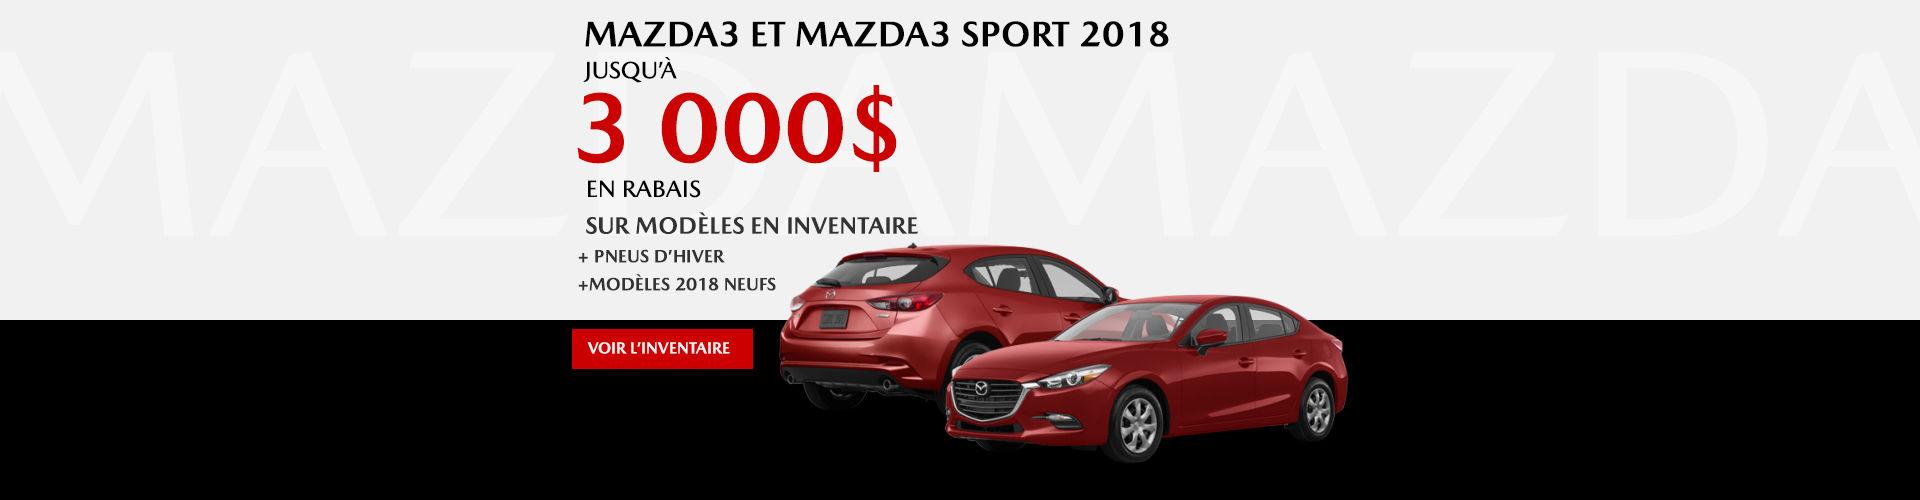 Offre sur la Mazda3 et Mazda3 sport 2018